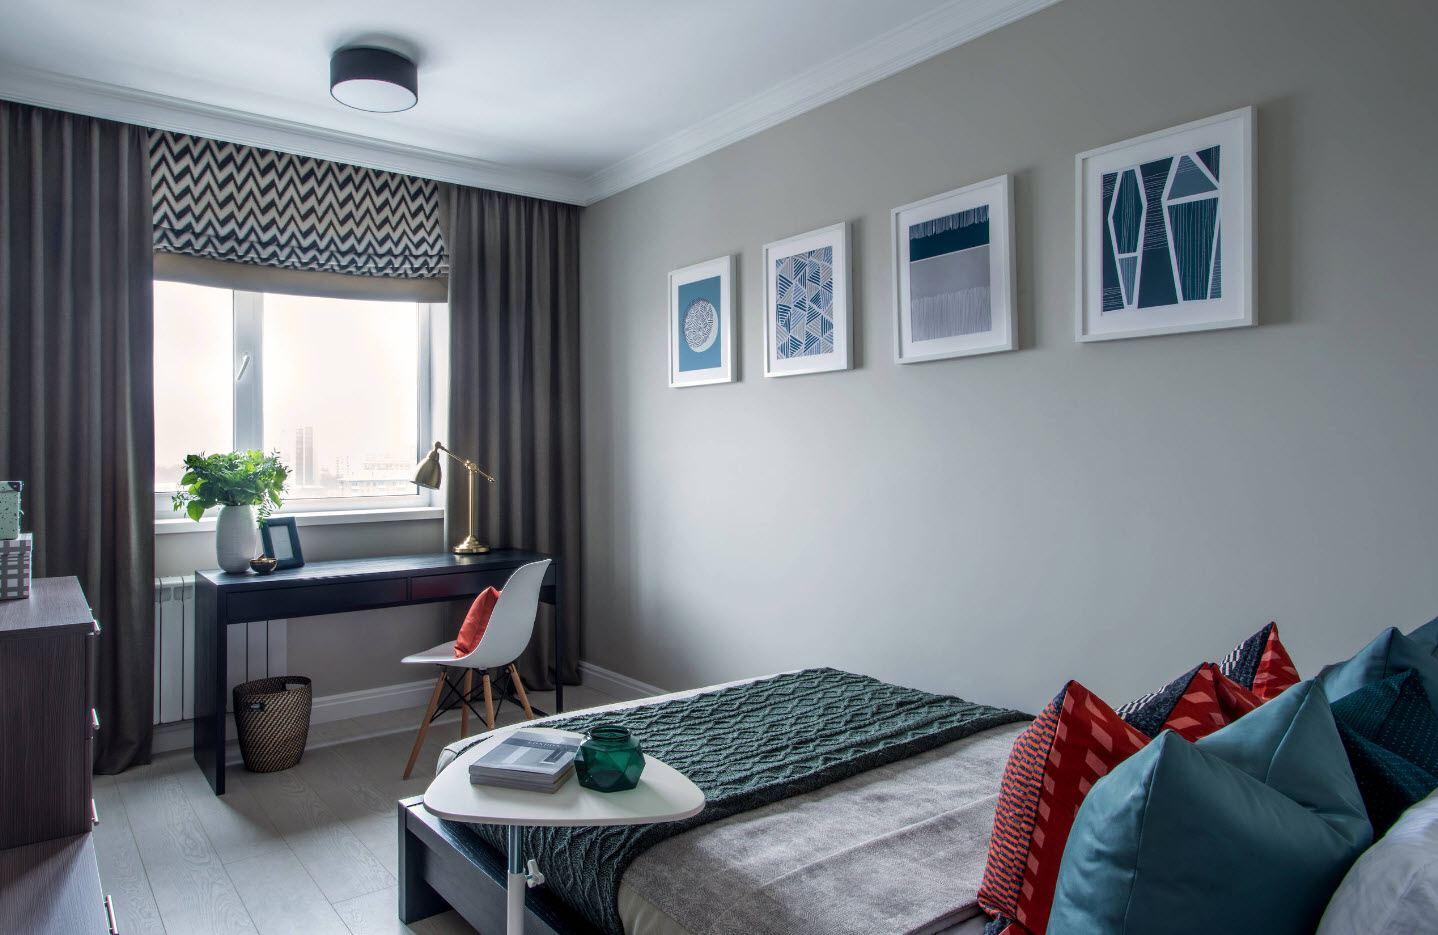 120 Square Feet Bedroom Interior Decoration Ideas. Calm interior with pictures decoration